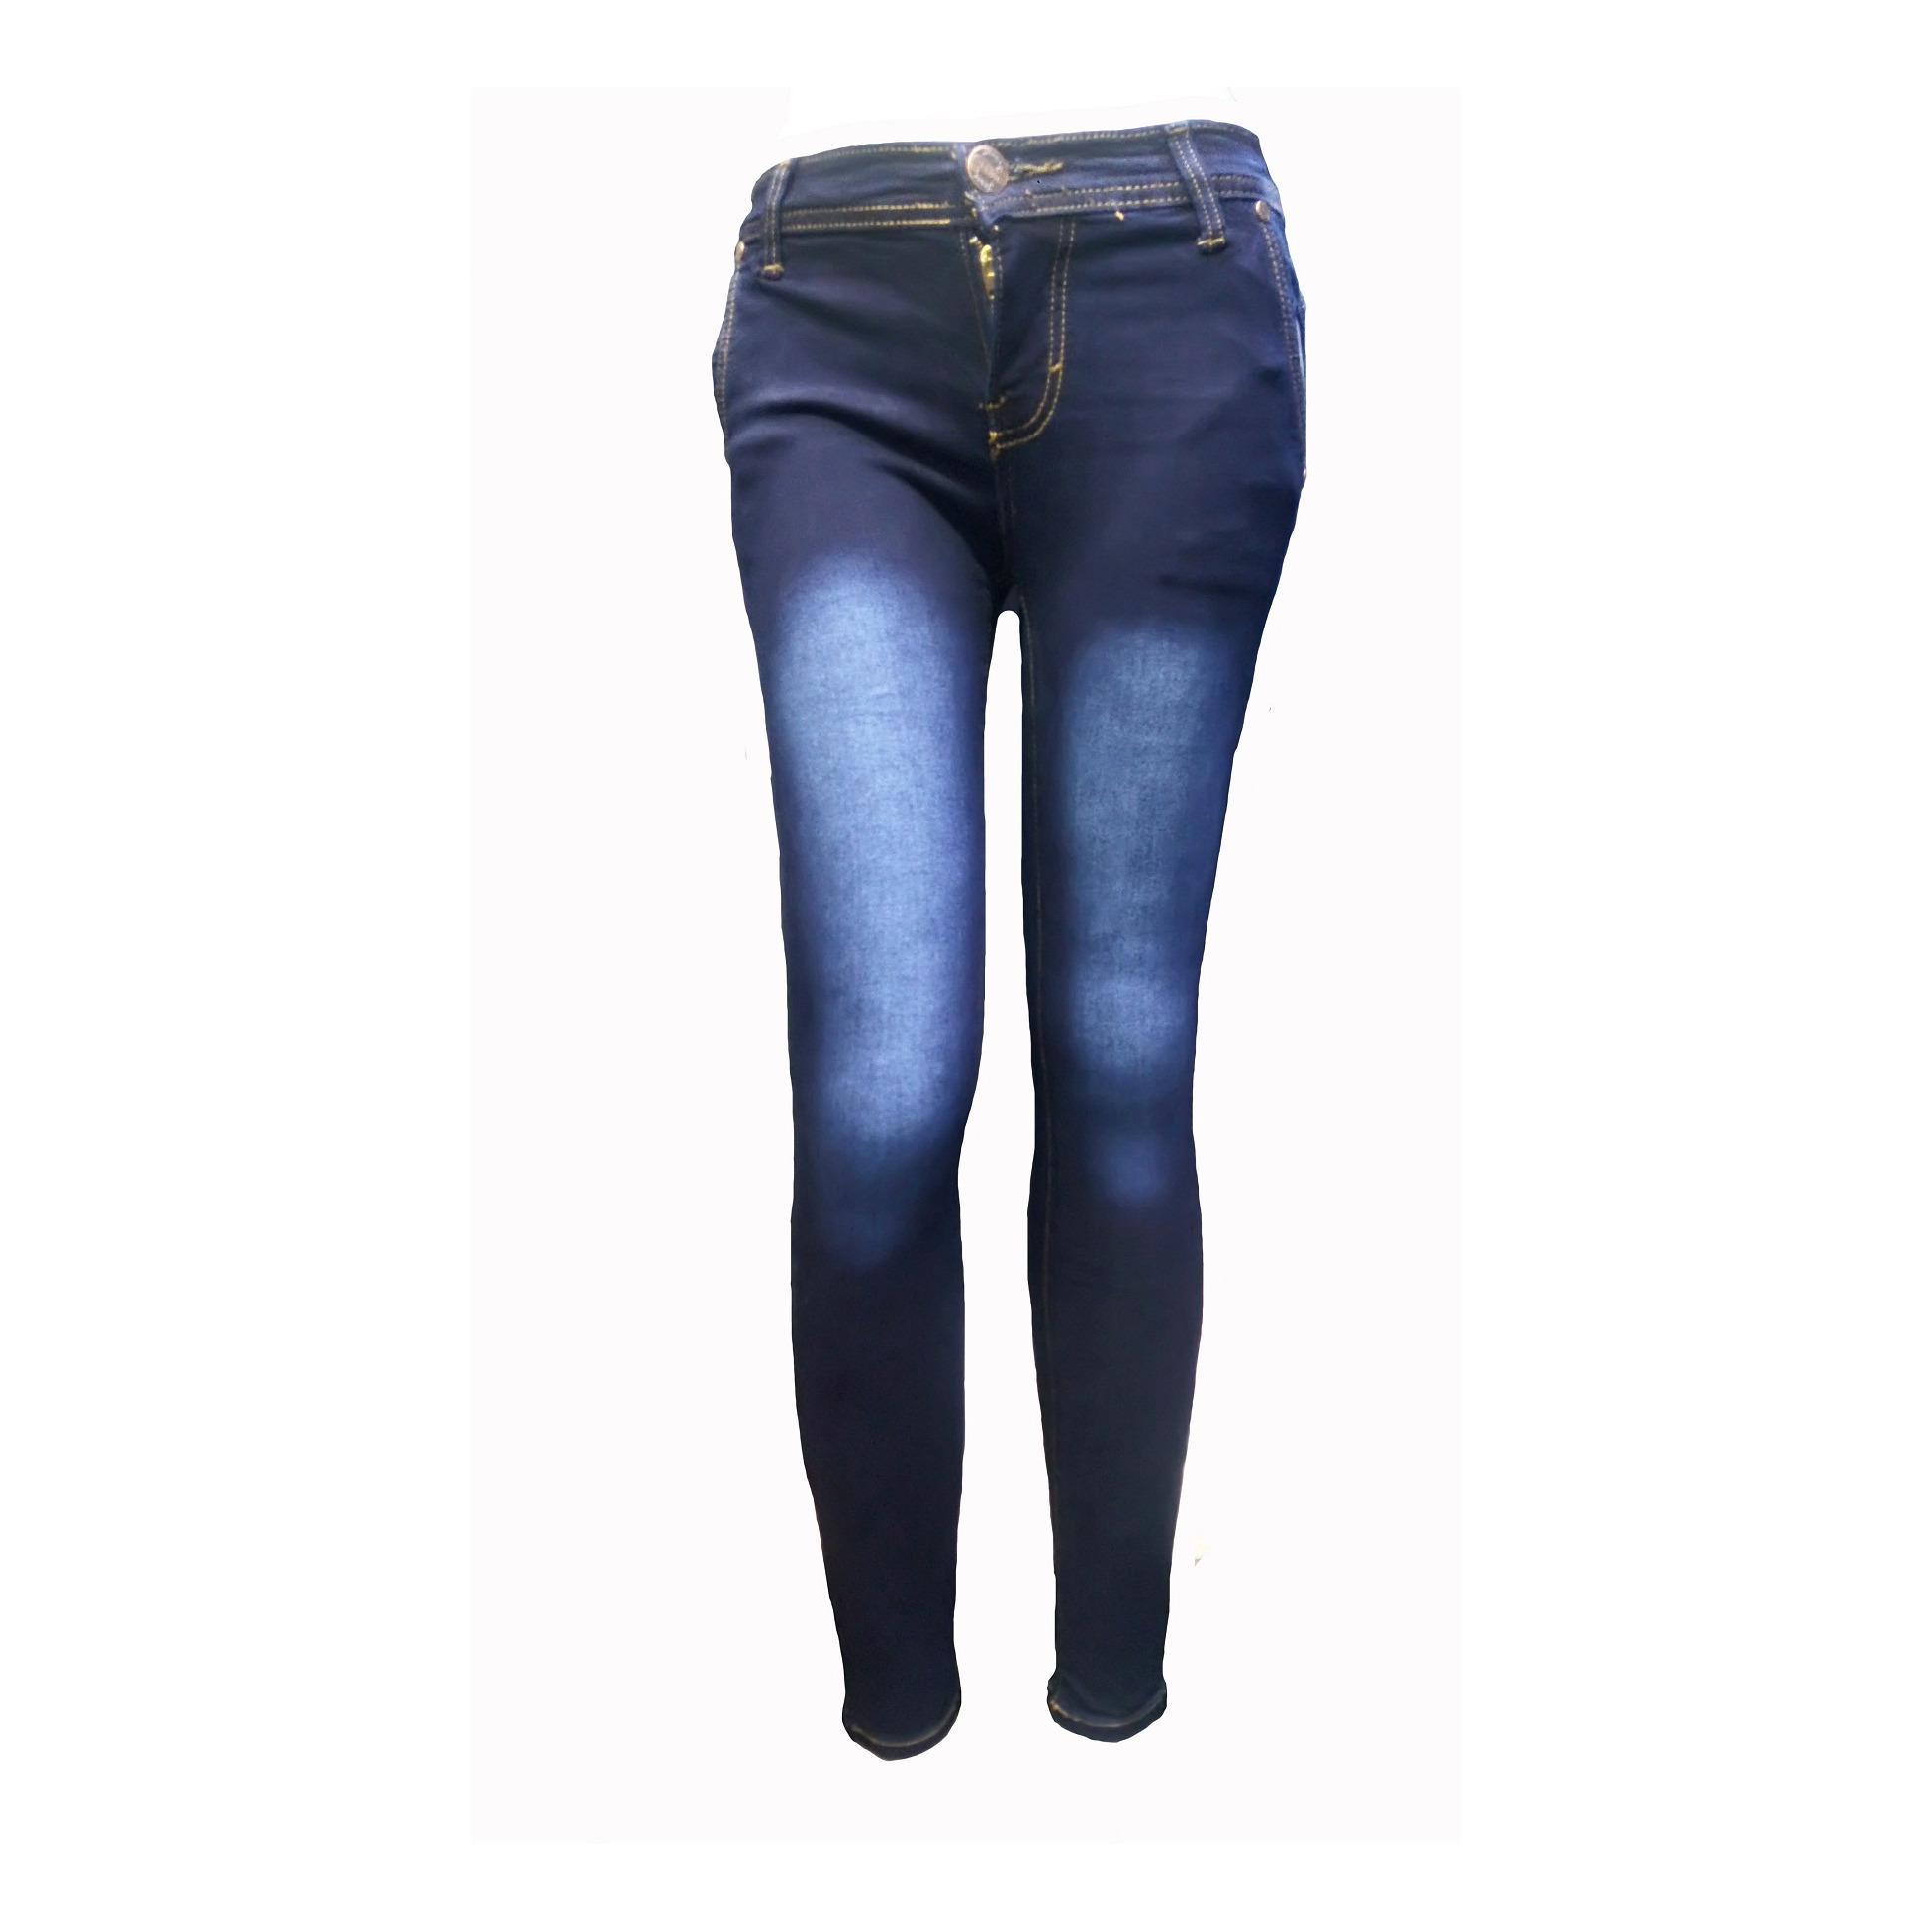 NJ Nuriel Jeans – Celana Jeans Wanita – Denim Premium Quality – New Arrival Skinny Pensil – Navy  – Size 27-30